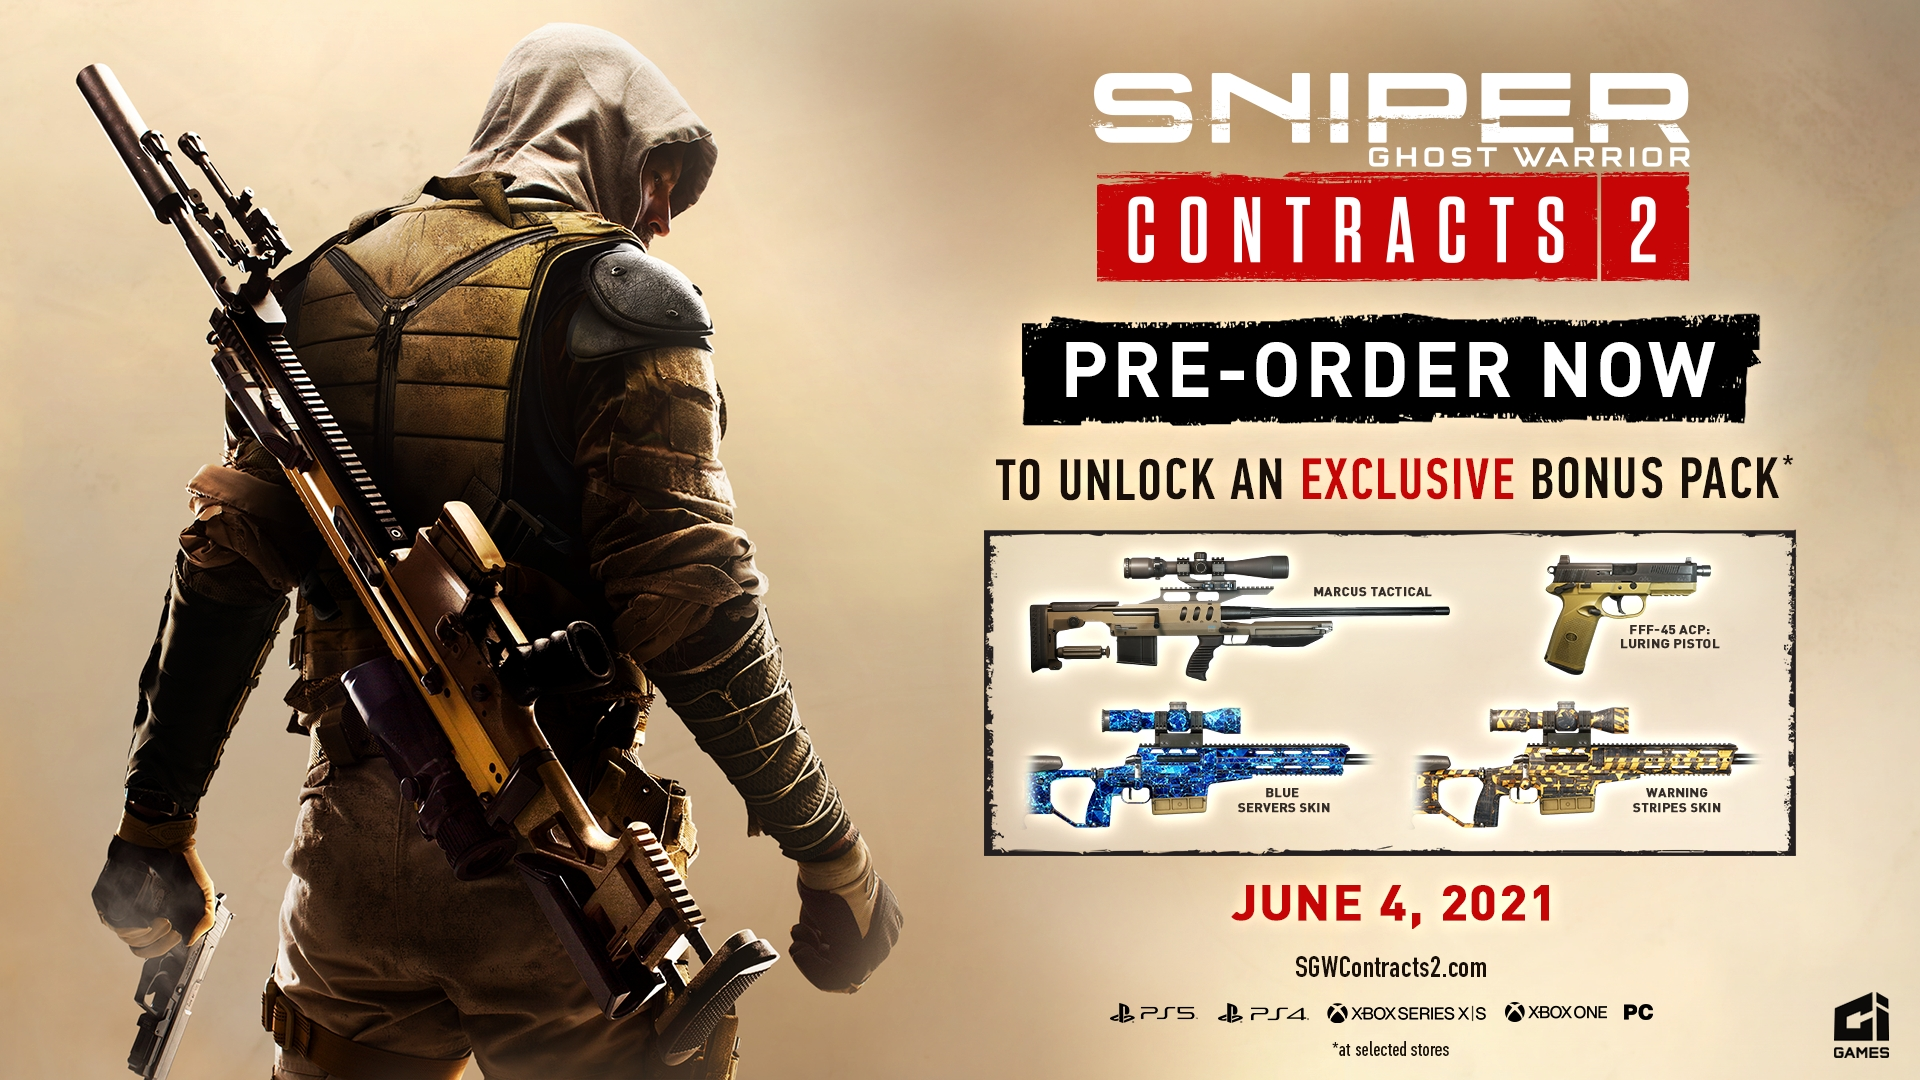 Sniper Ghost Warrior Contracts 2 Pre-Order Bonus